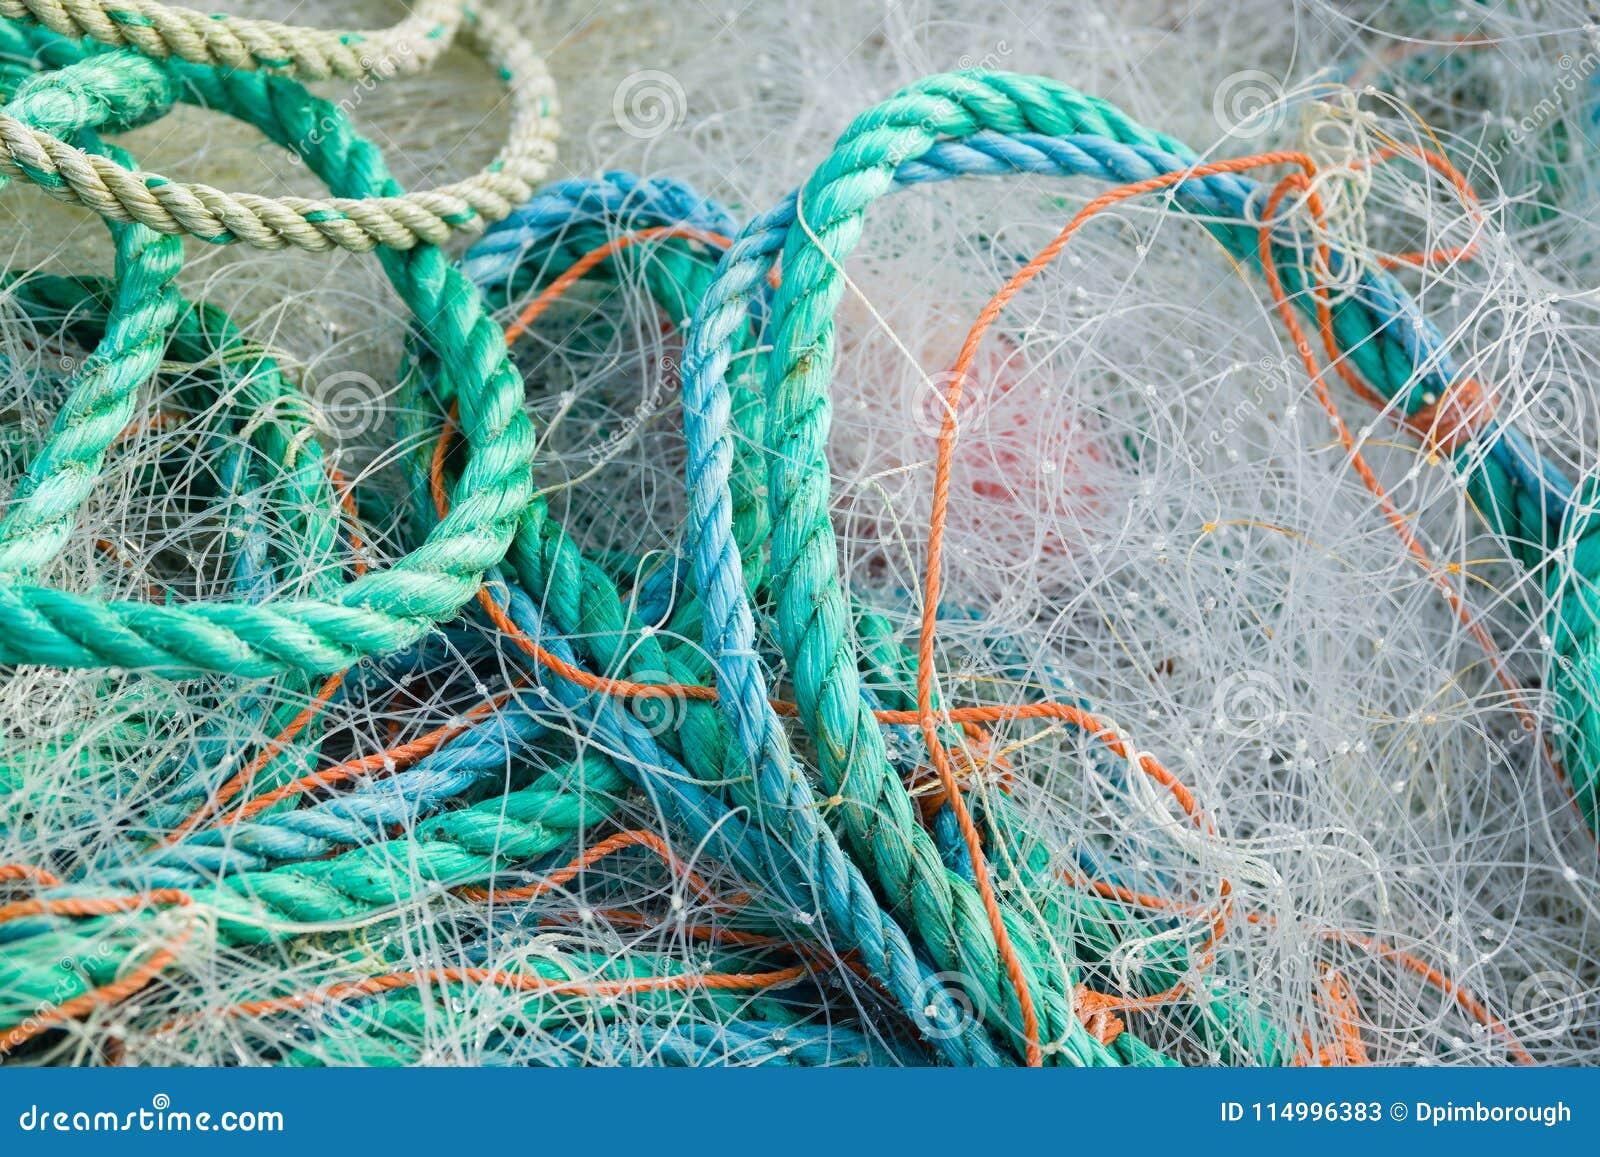 Fishing Nets and Debris